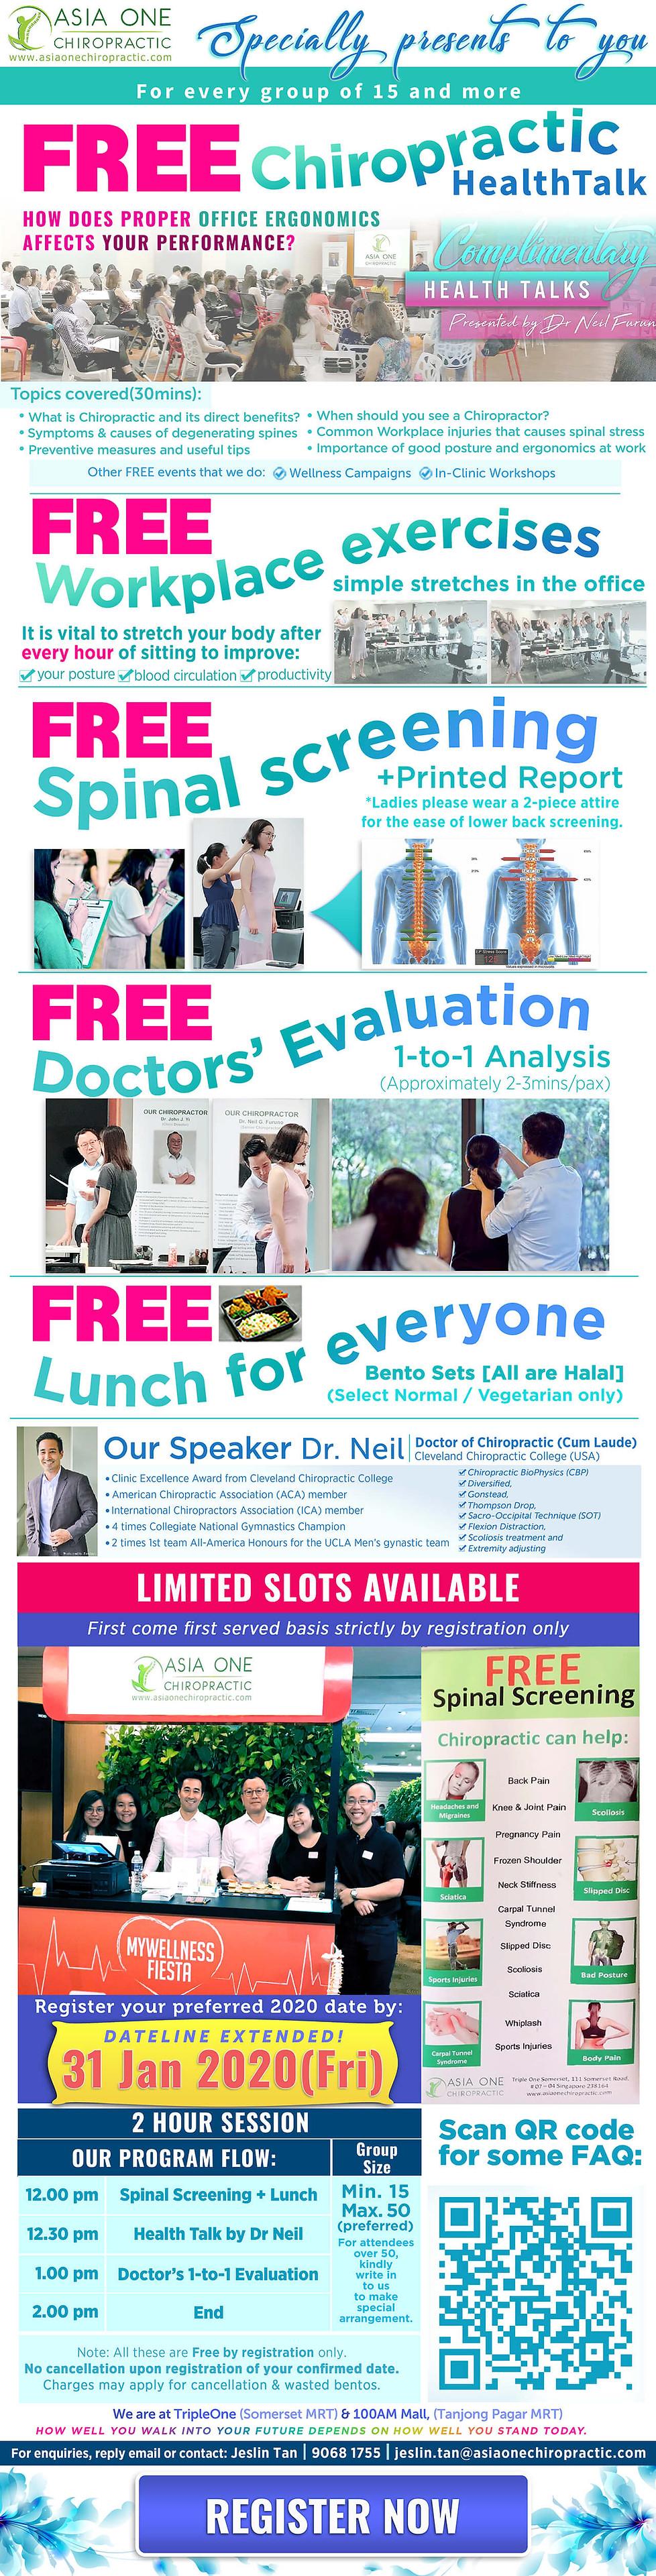 EDM(portrait) - FREE Chiropractic Health